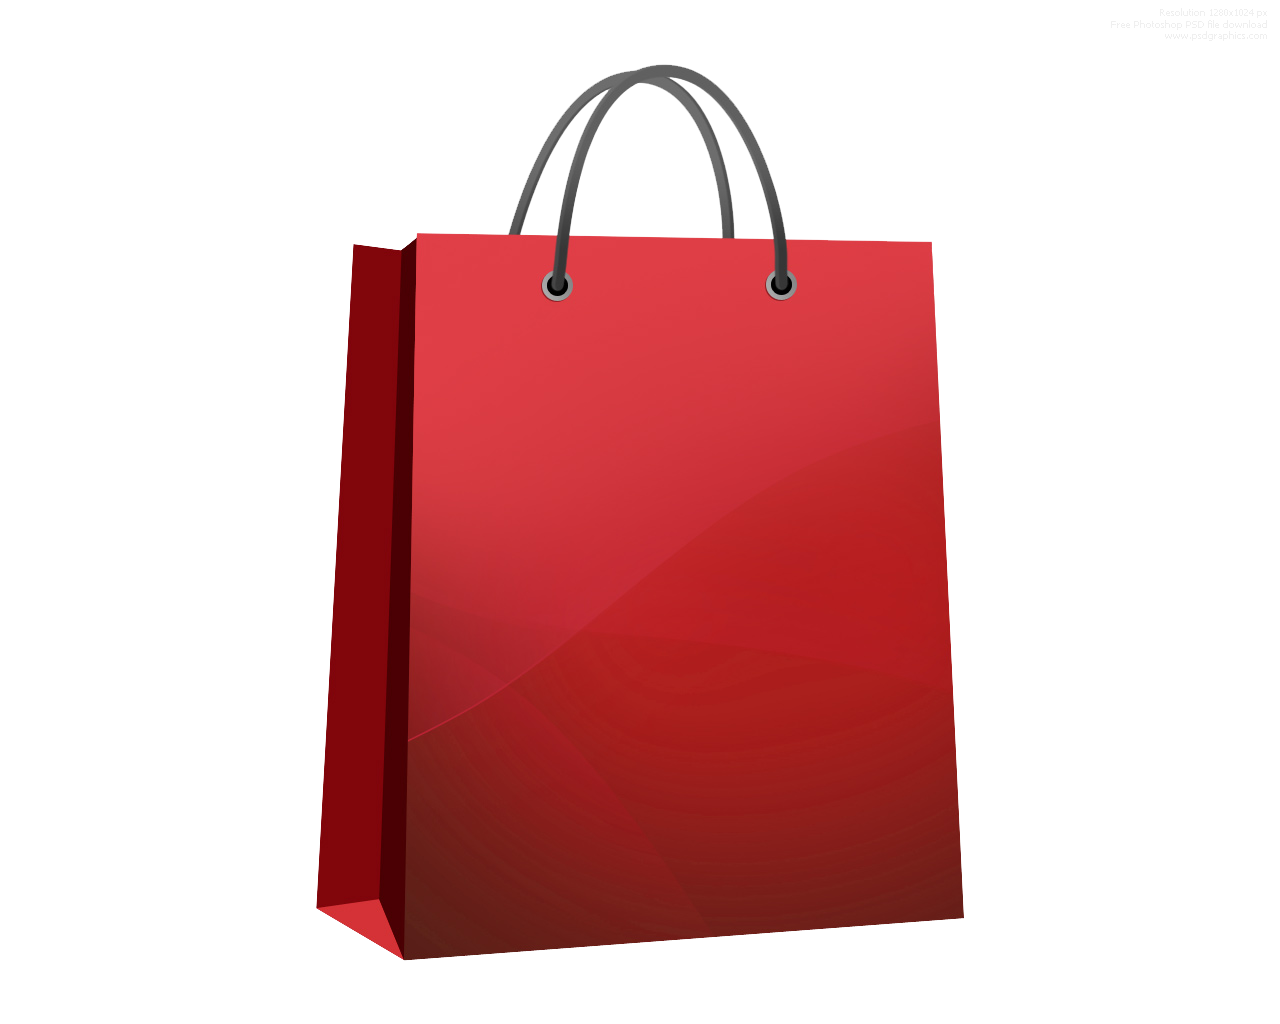 Shopping Bag PNG Transparent Images.